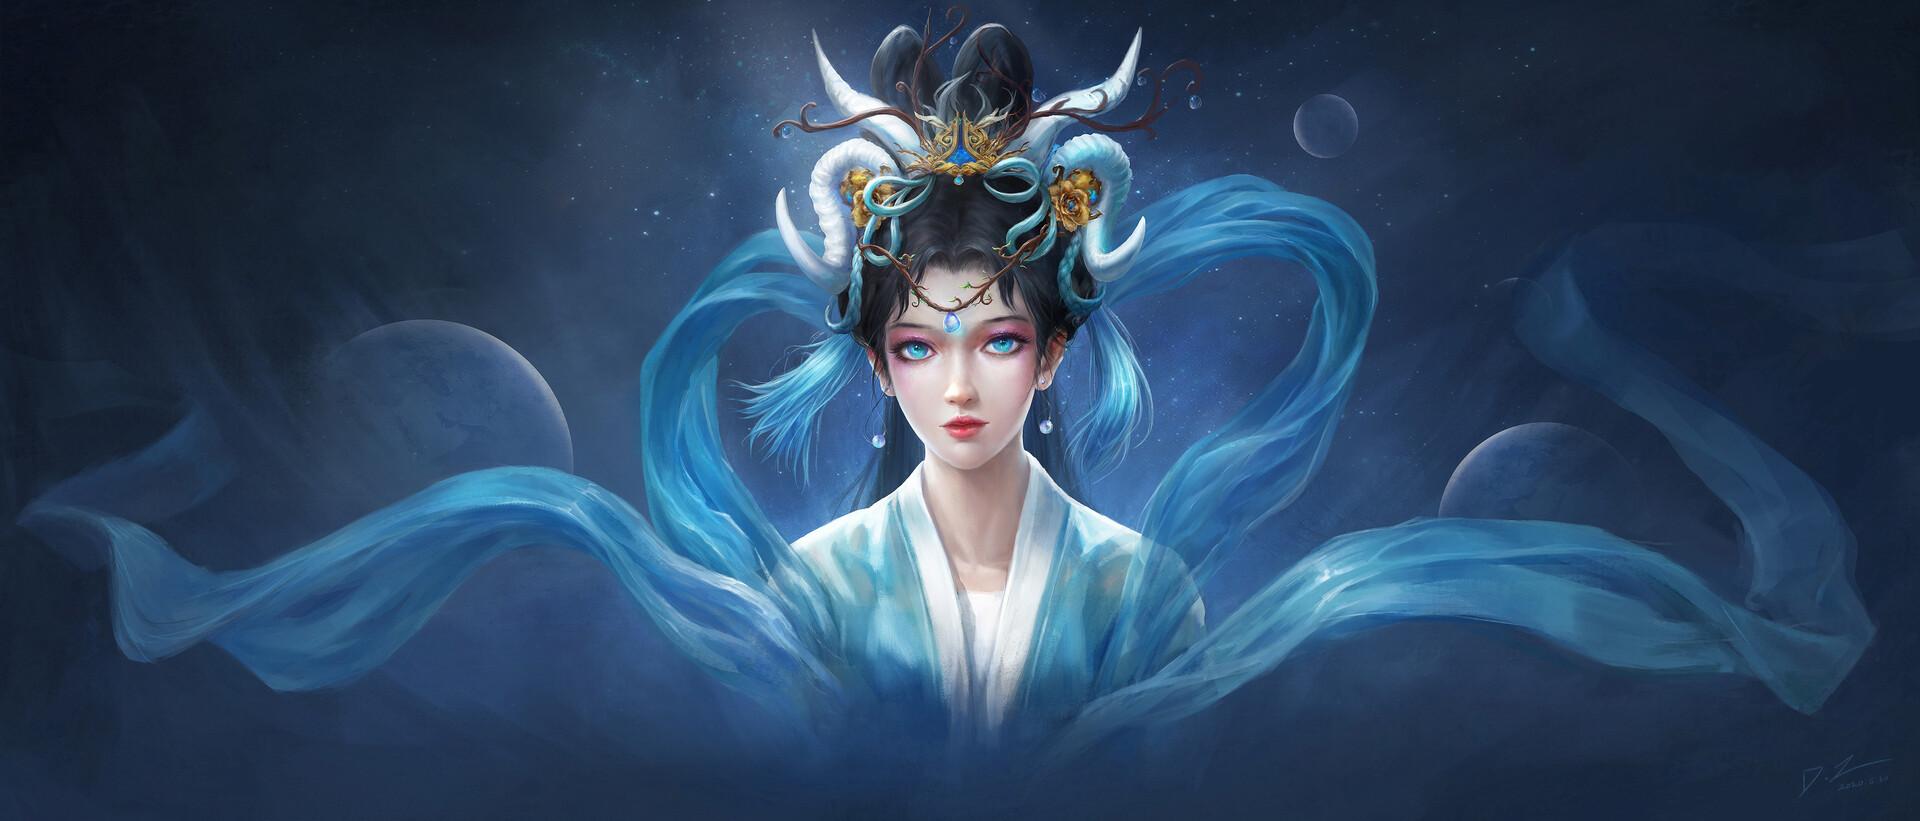 General 1920x821 fantasy art artwork blue eyes fantasy girl